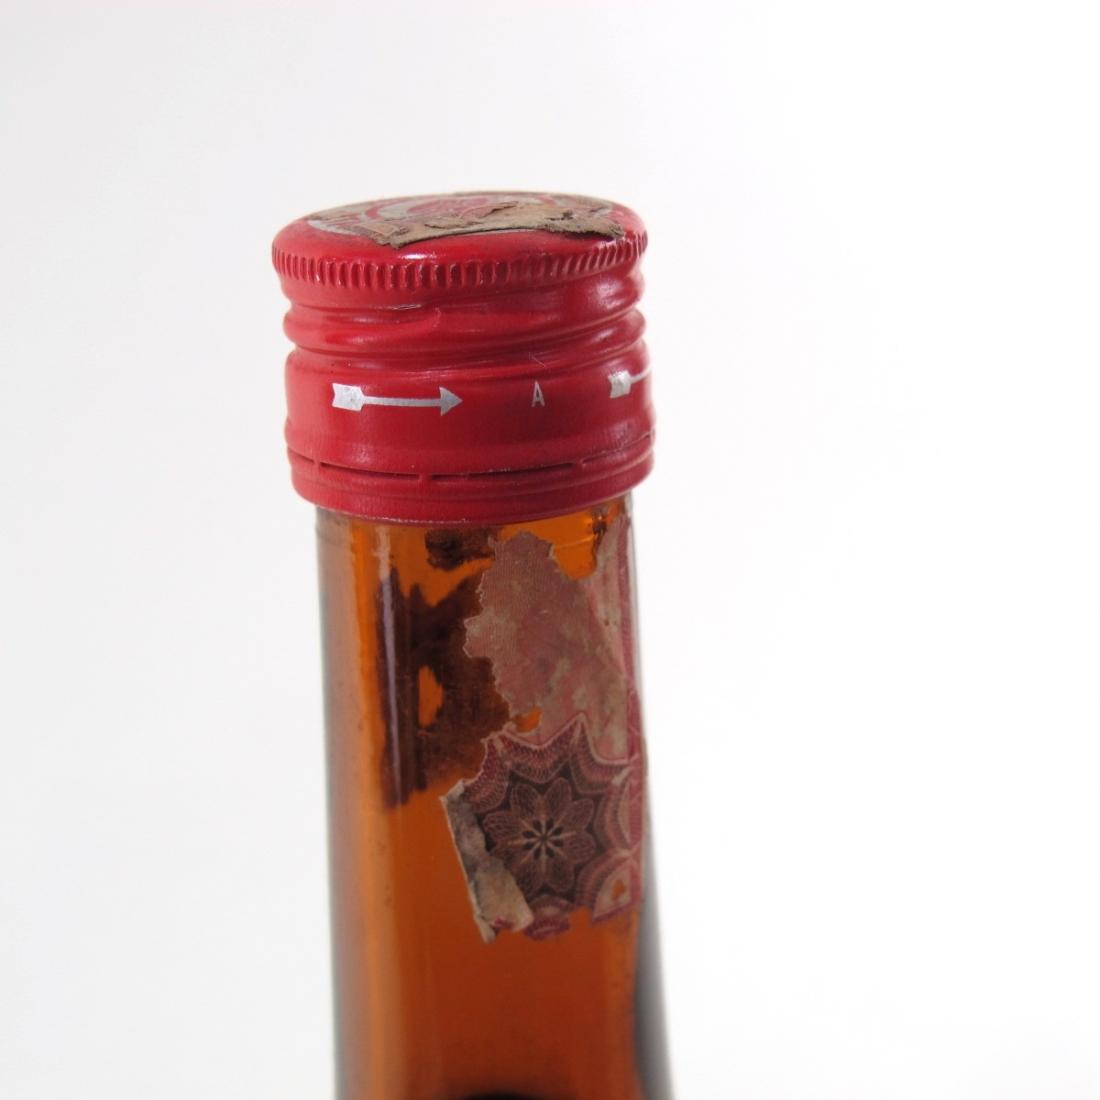 Riccadonna Elixir China 1 Litre 1960s